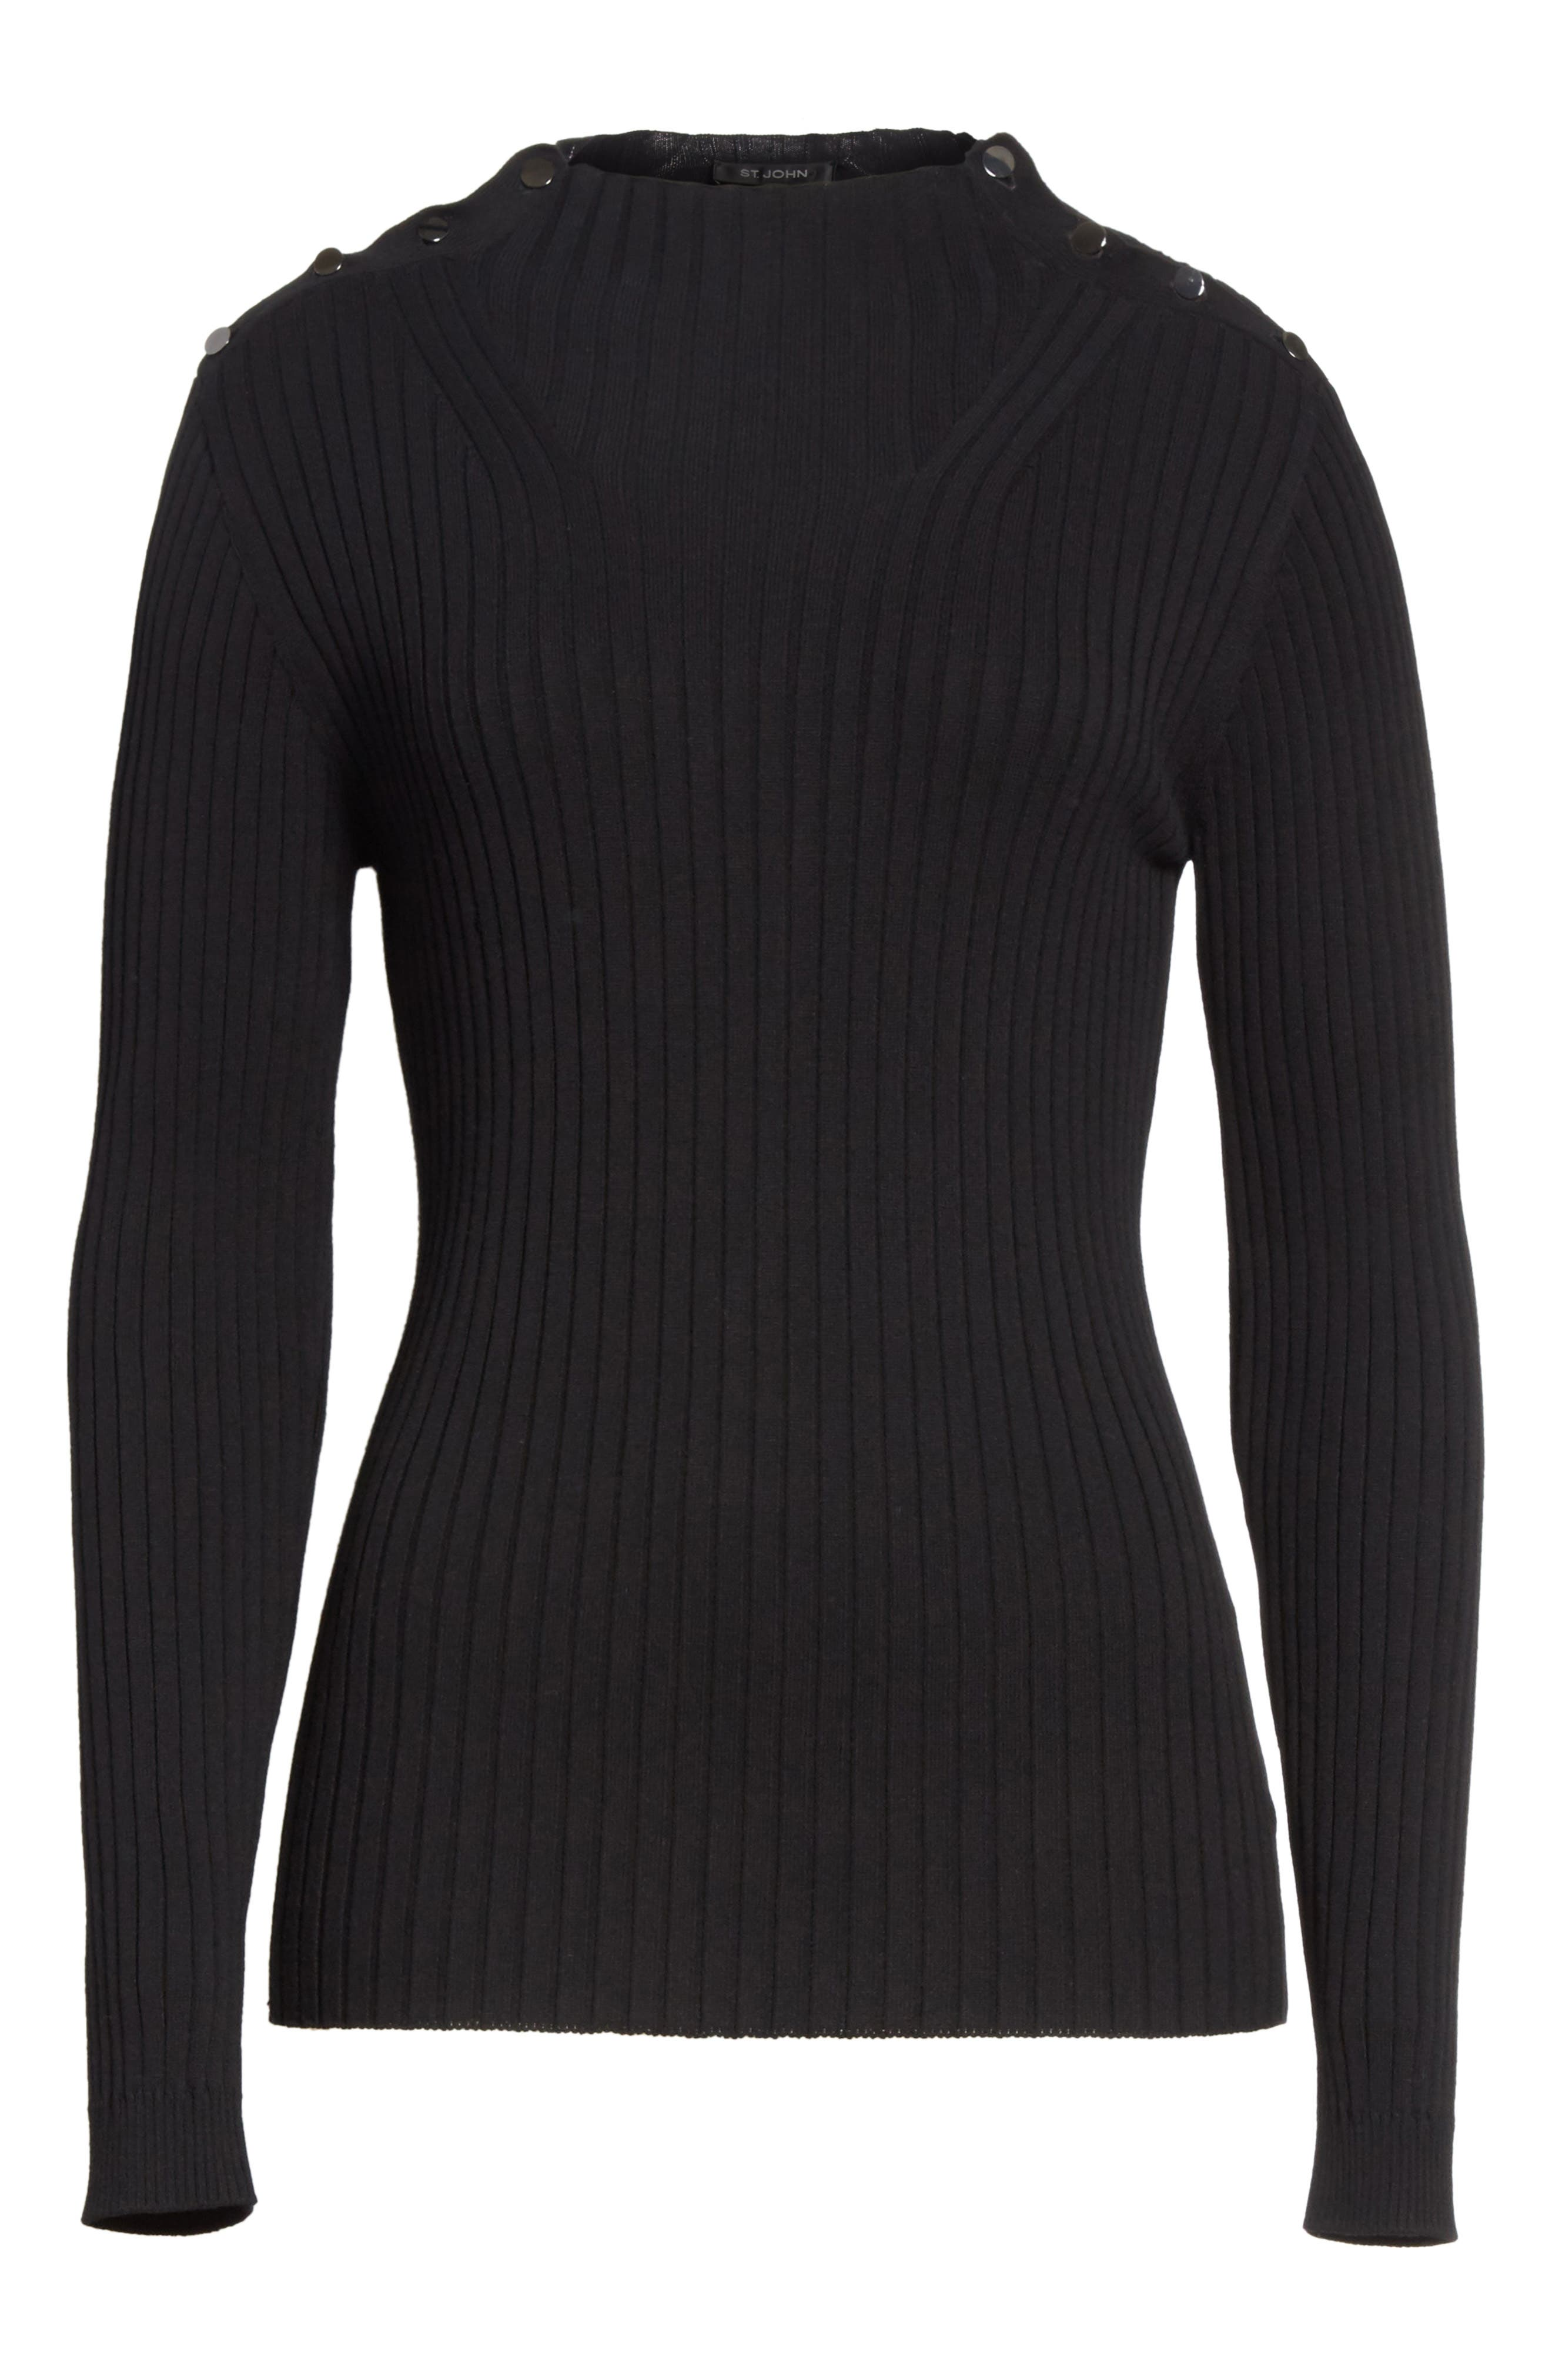 Flat Rib Knit Mock Neck Sweater,                             Alternate thumbnail 8, color,                             Caviar